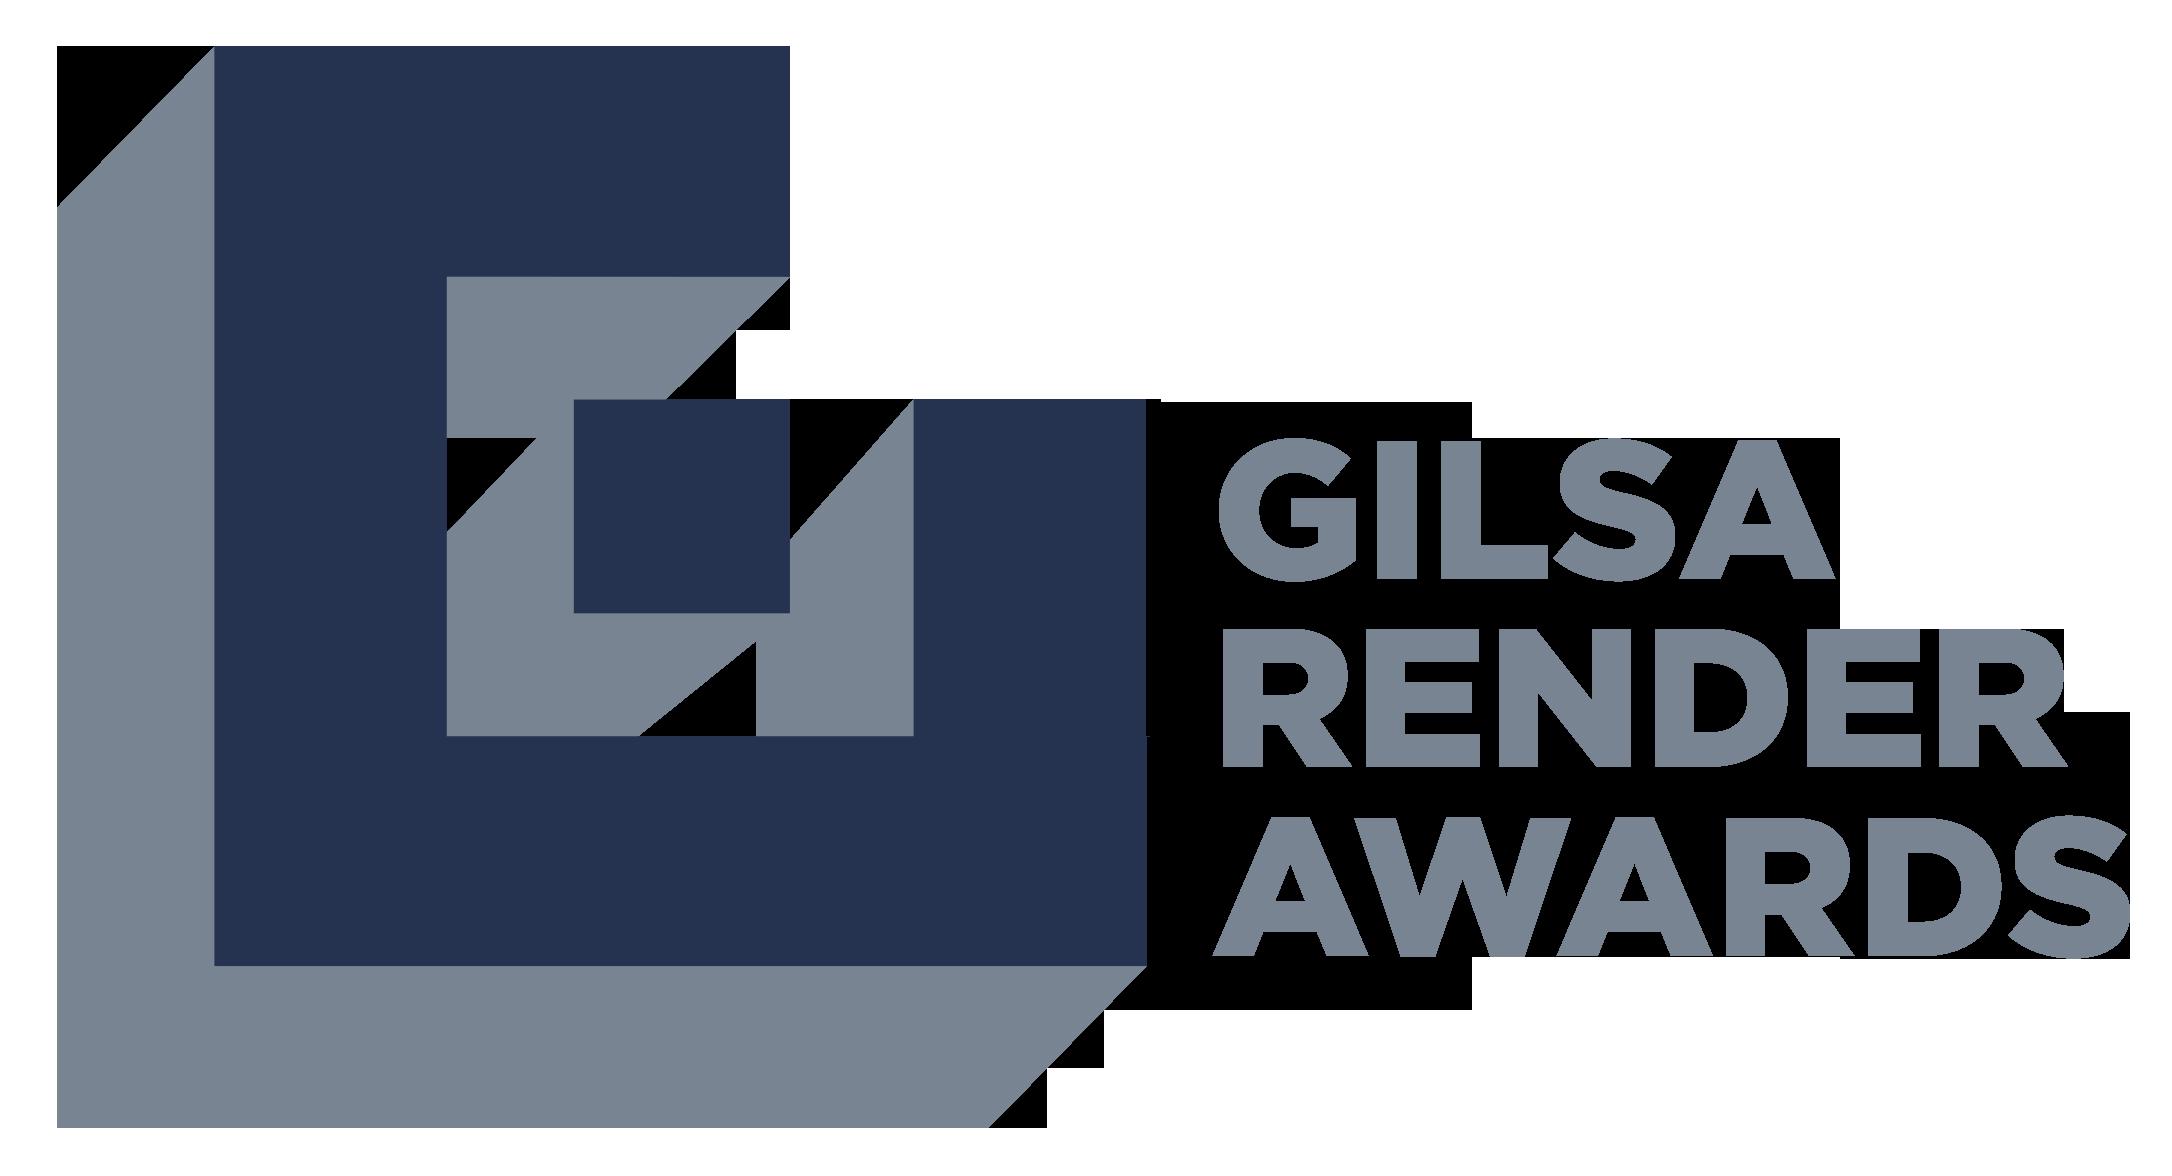 GILSA RENDER AWARDS